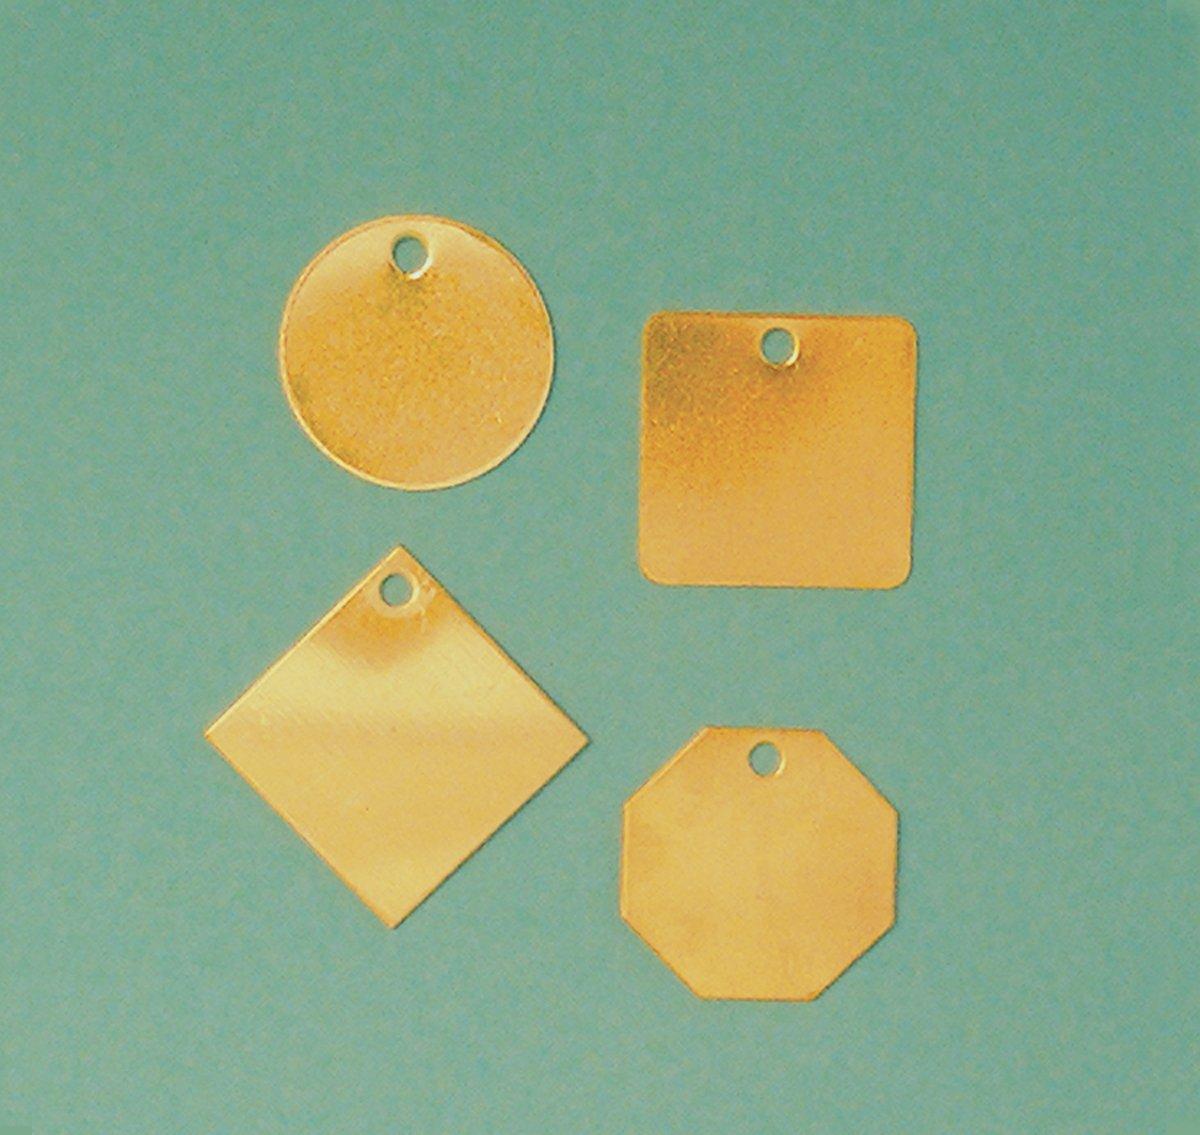 Accuform TDB122 Brass Blank Identification Tag, Octagon, 18 Gauge, 1-1/2